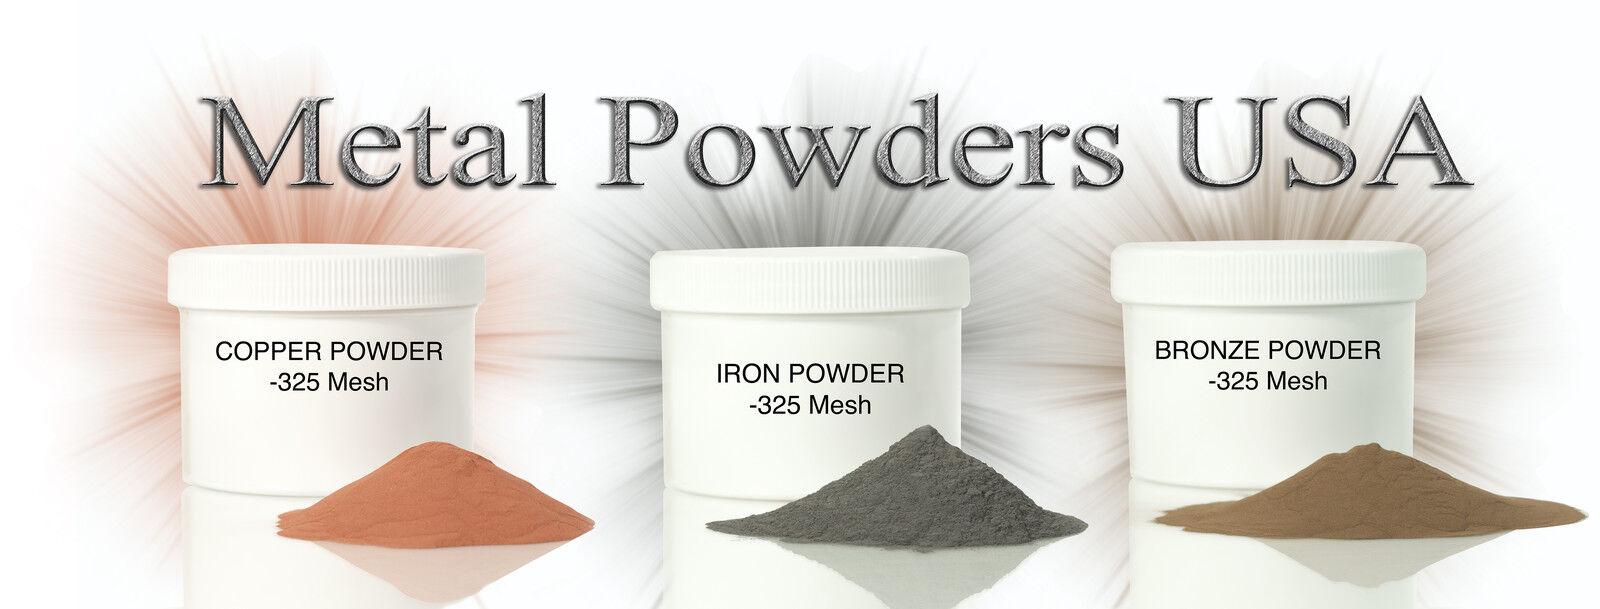 metalpowdersusa